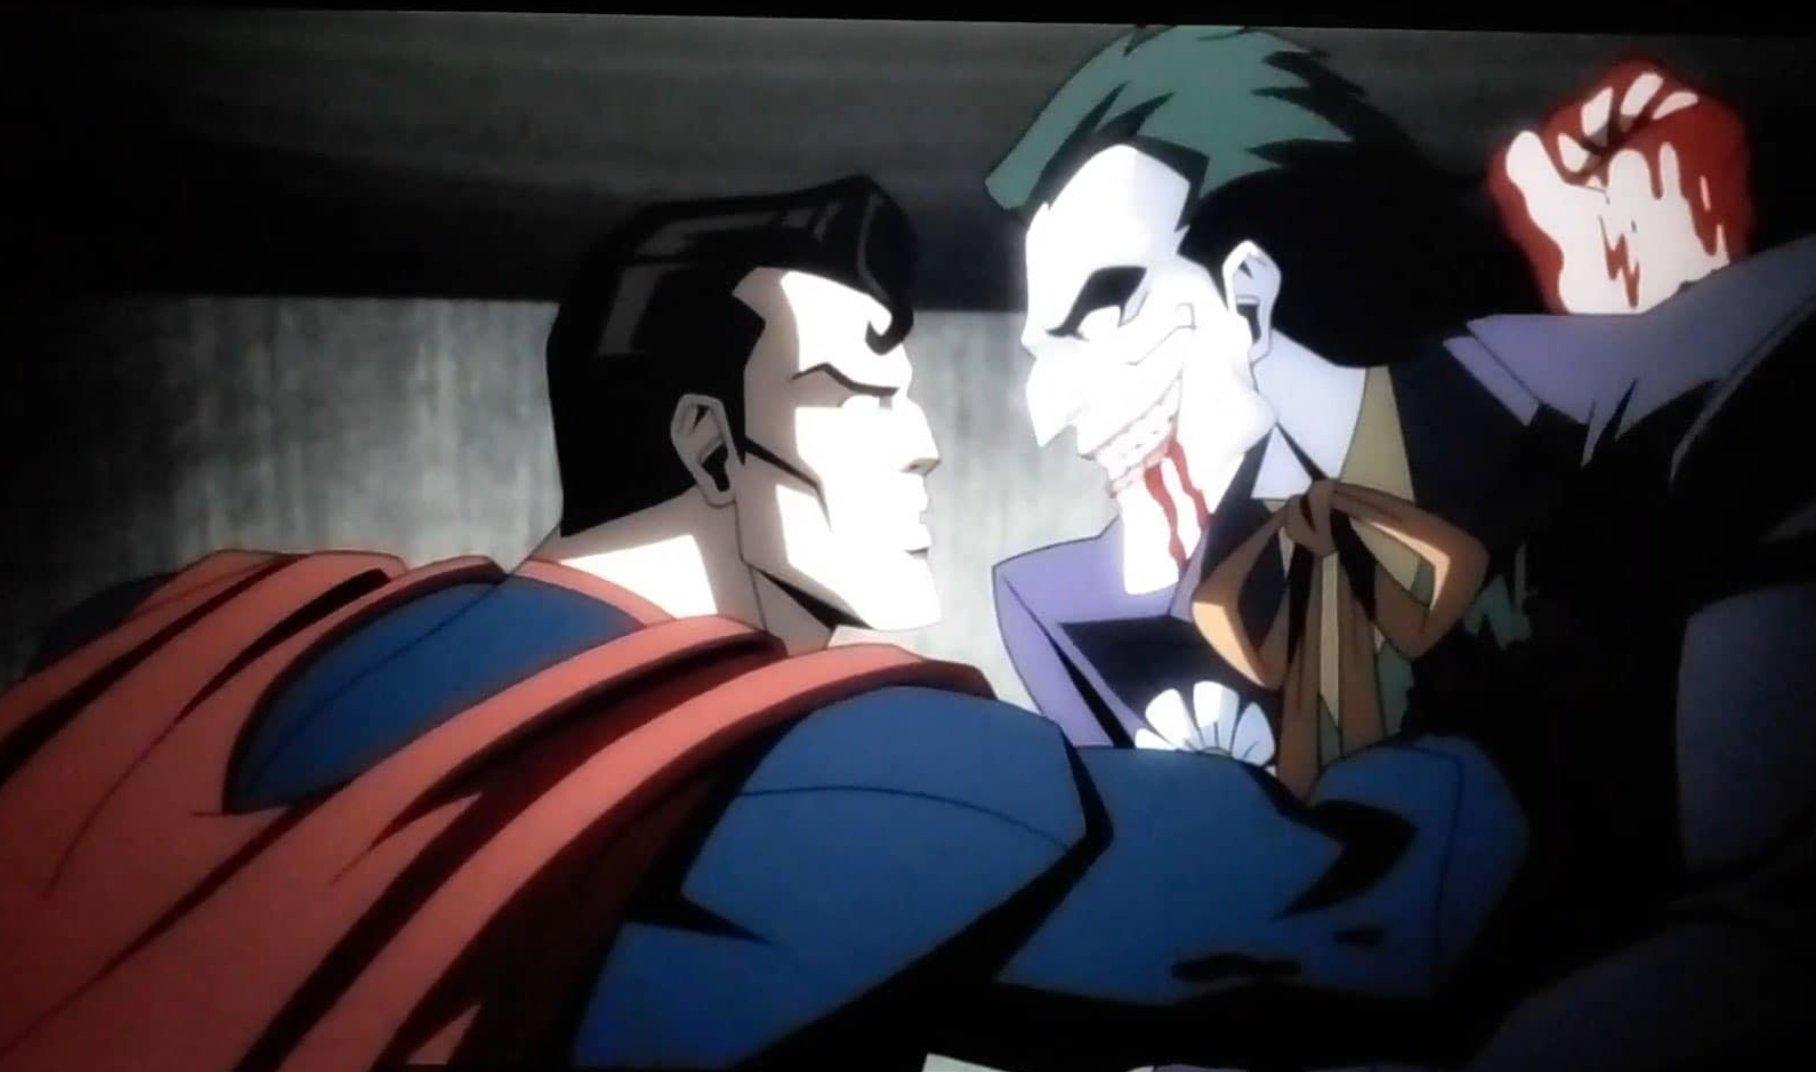 Superman mata joker injustice pelicula